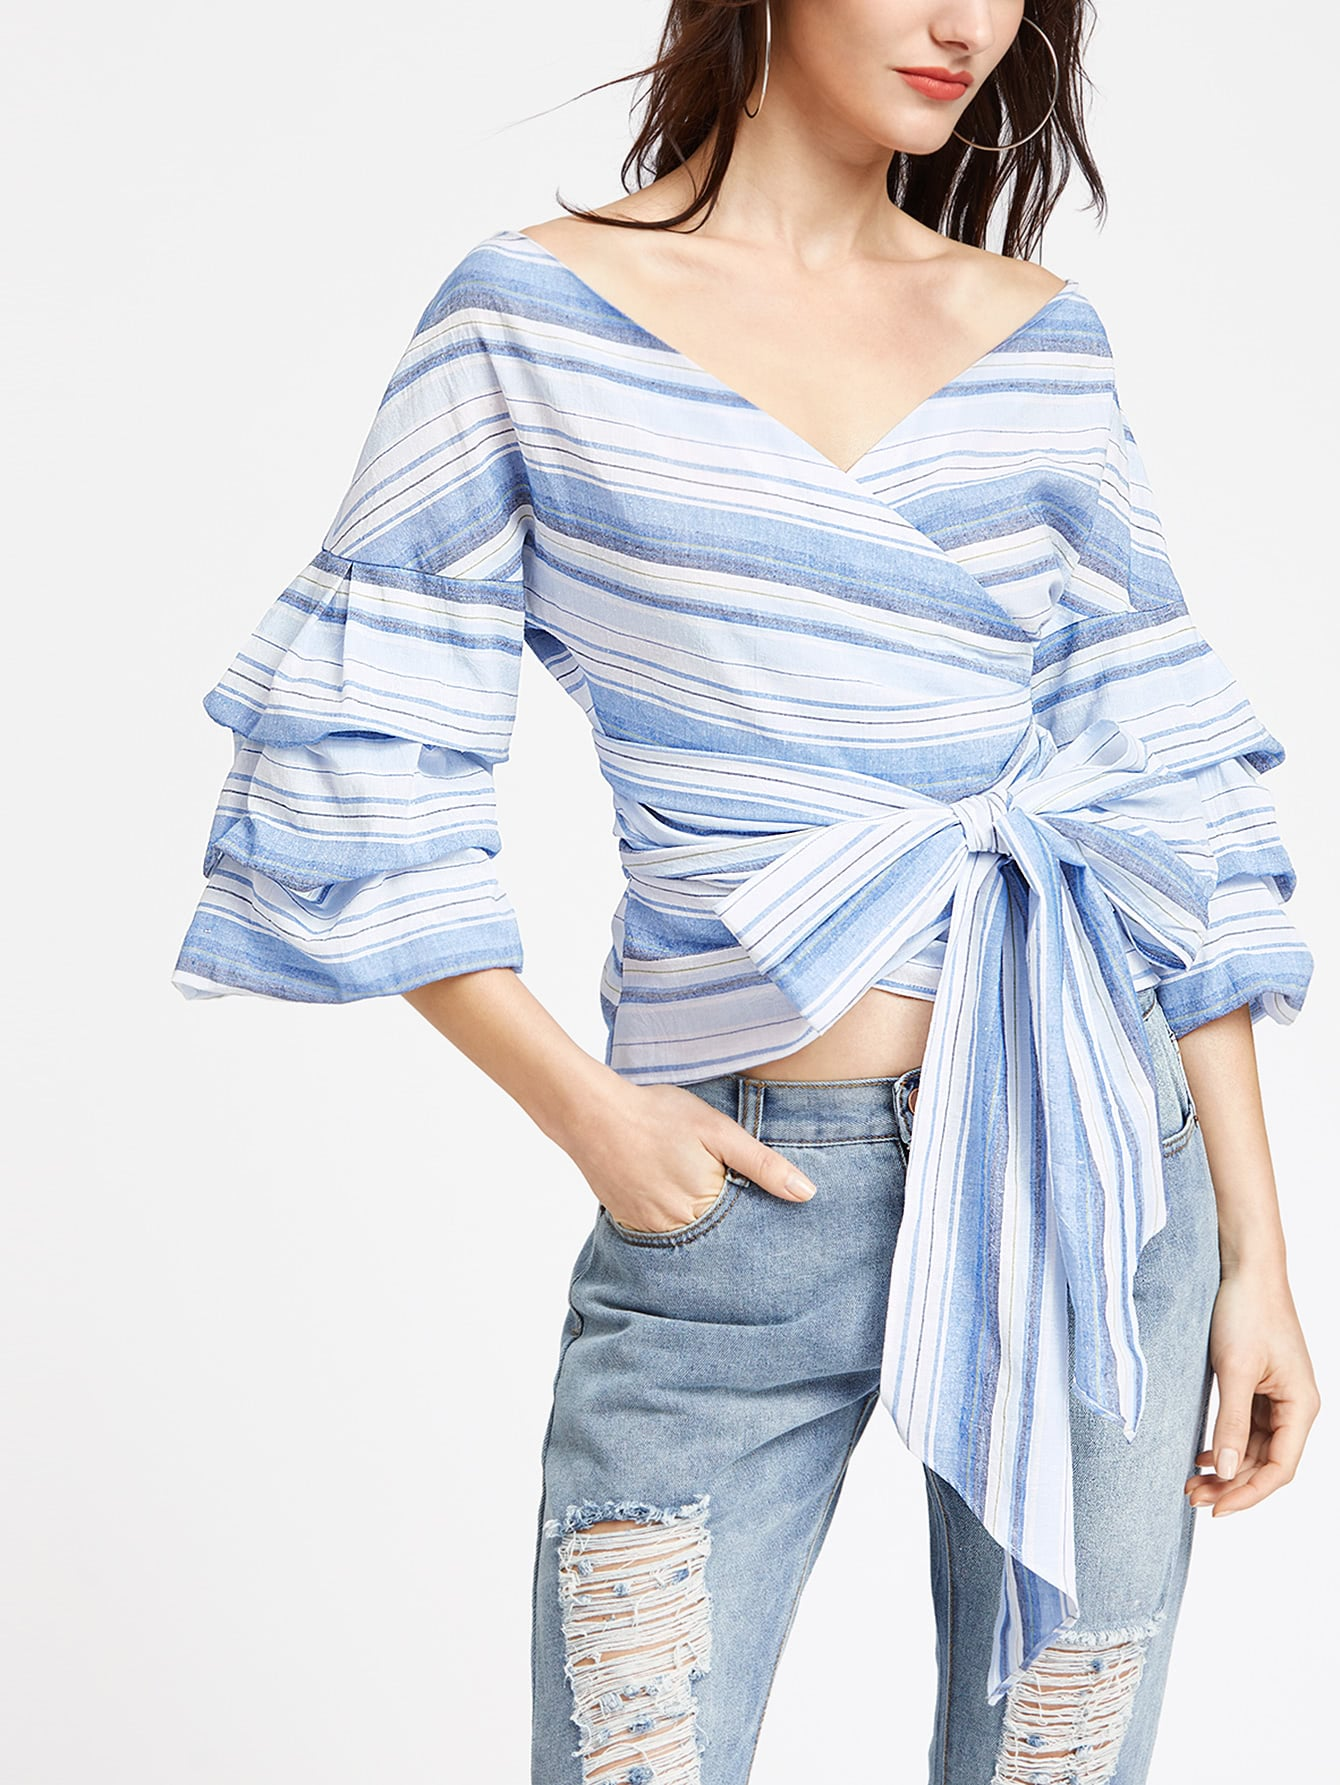 blouse170310702_2